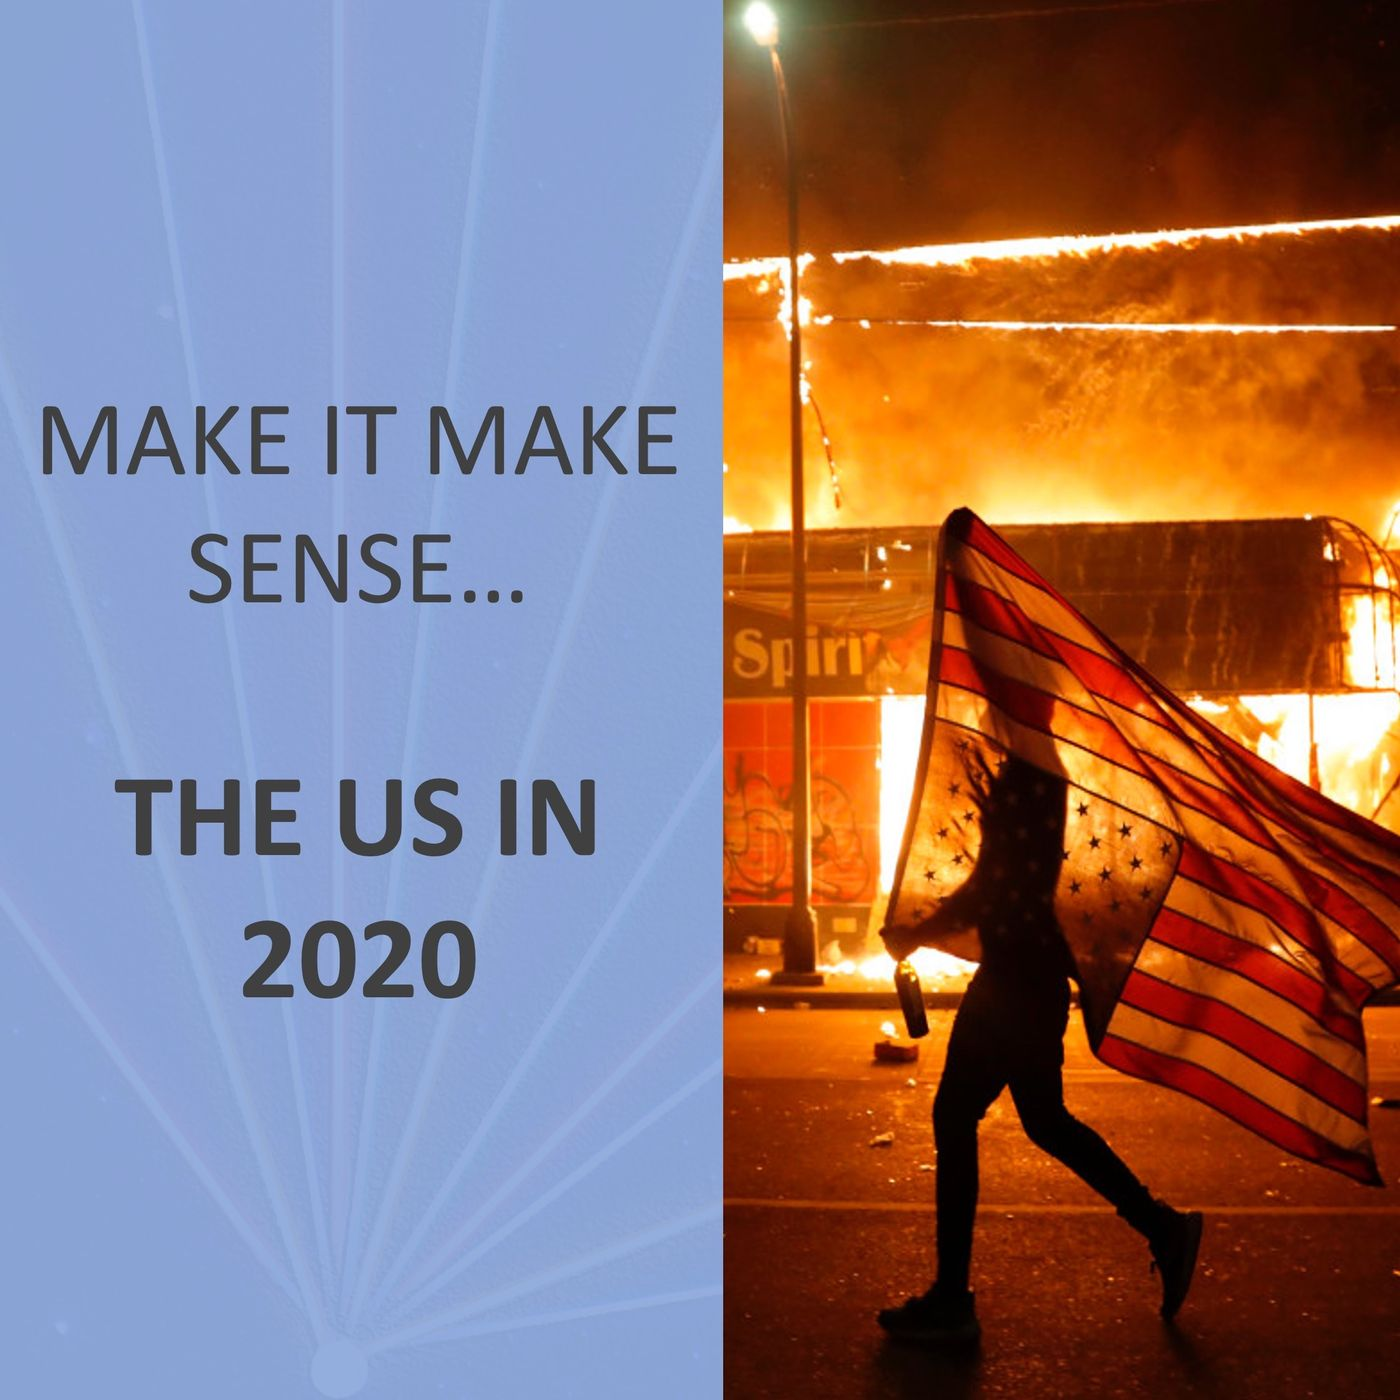 Make It Make Sense... The US in 2020